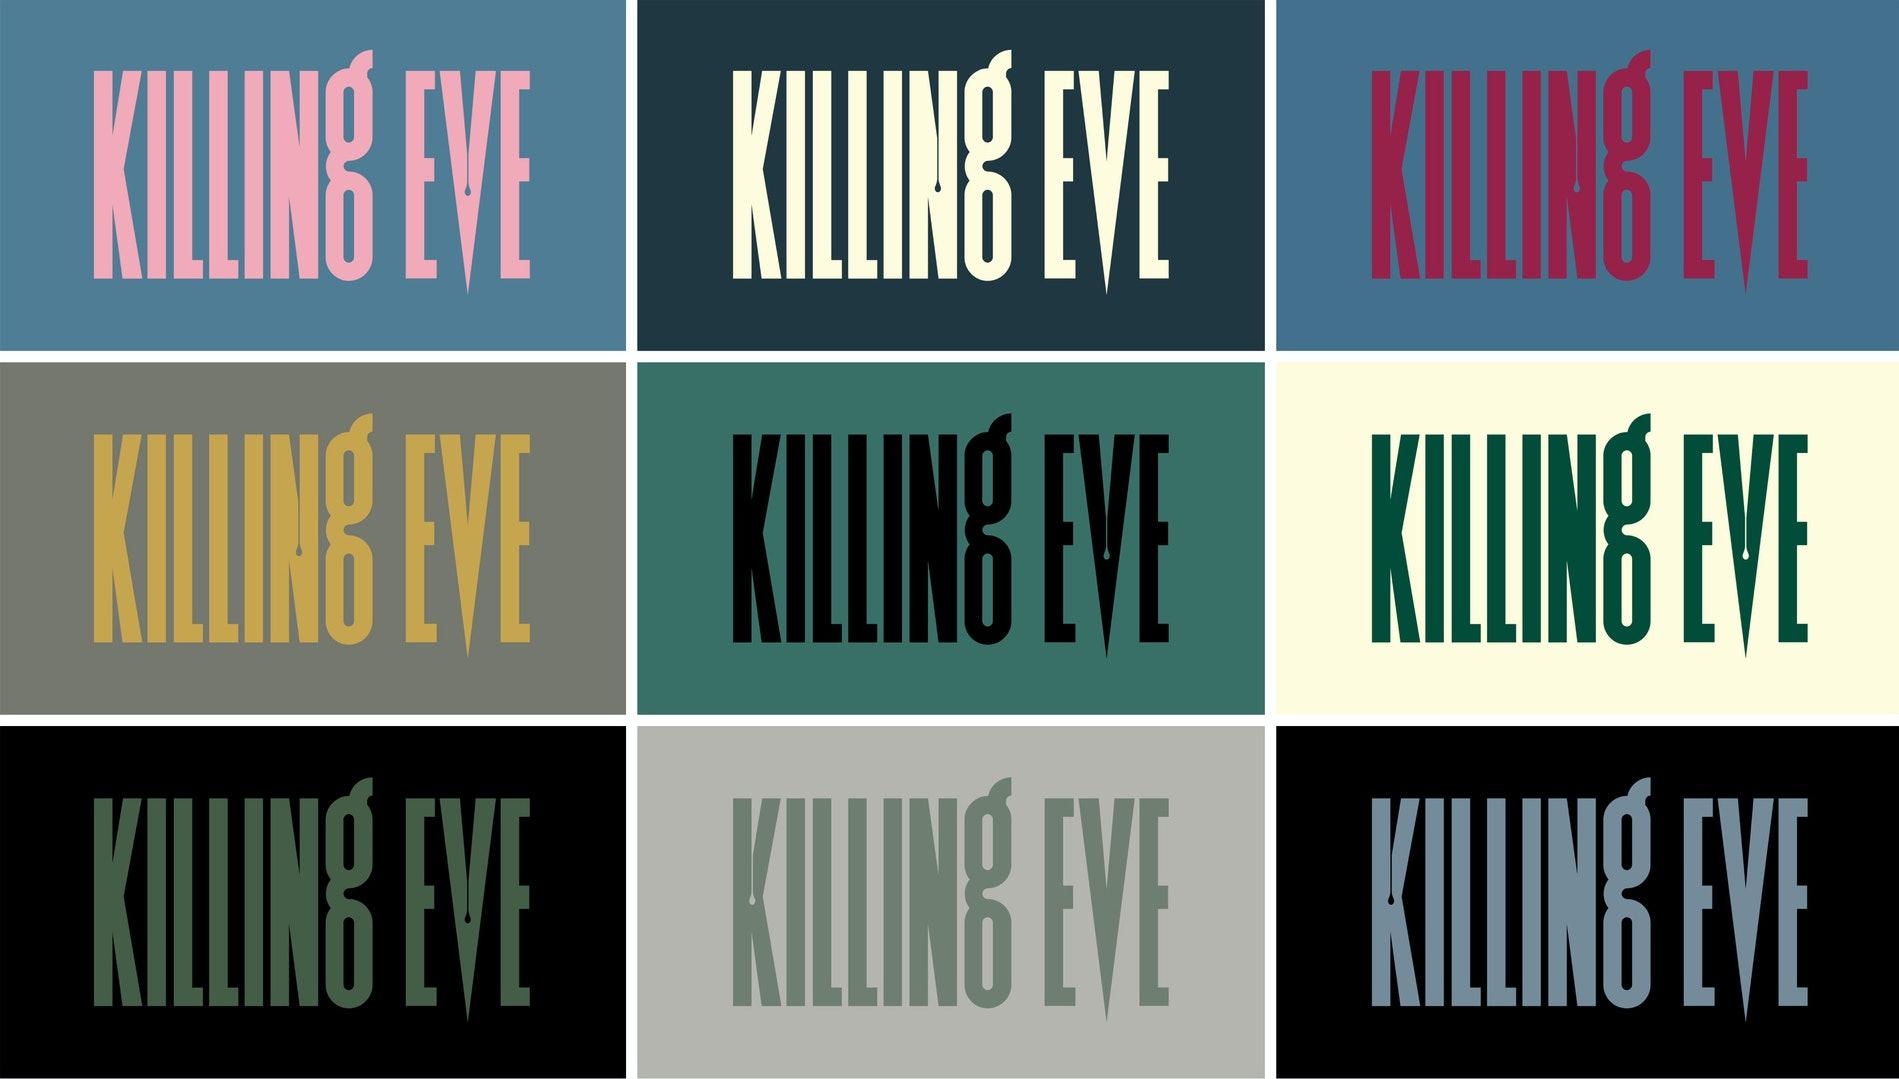 Familia tipografica en la serie Killing Eve